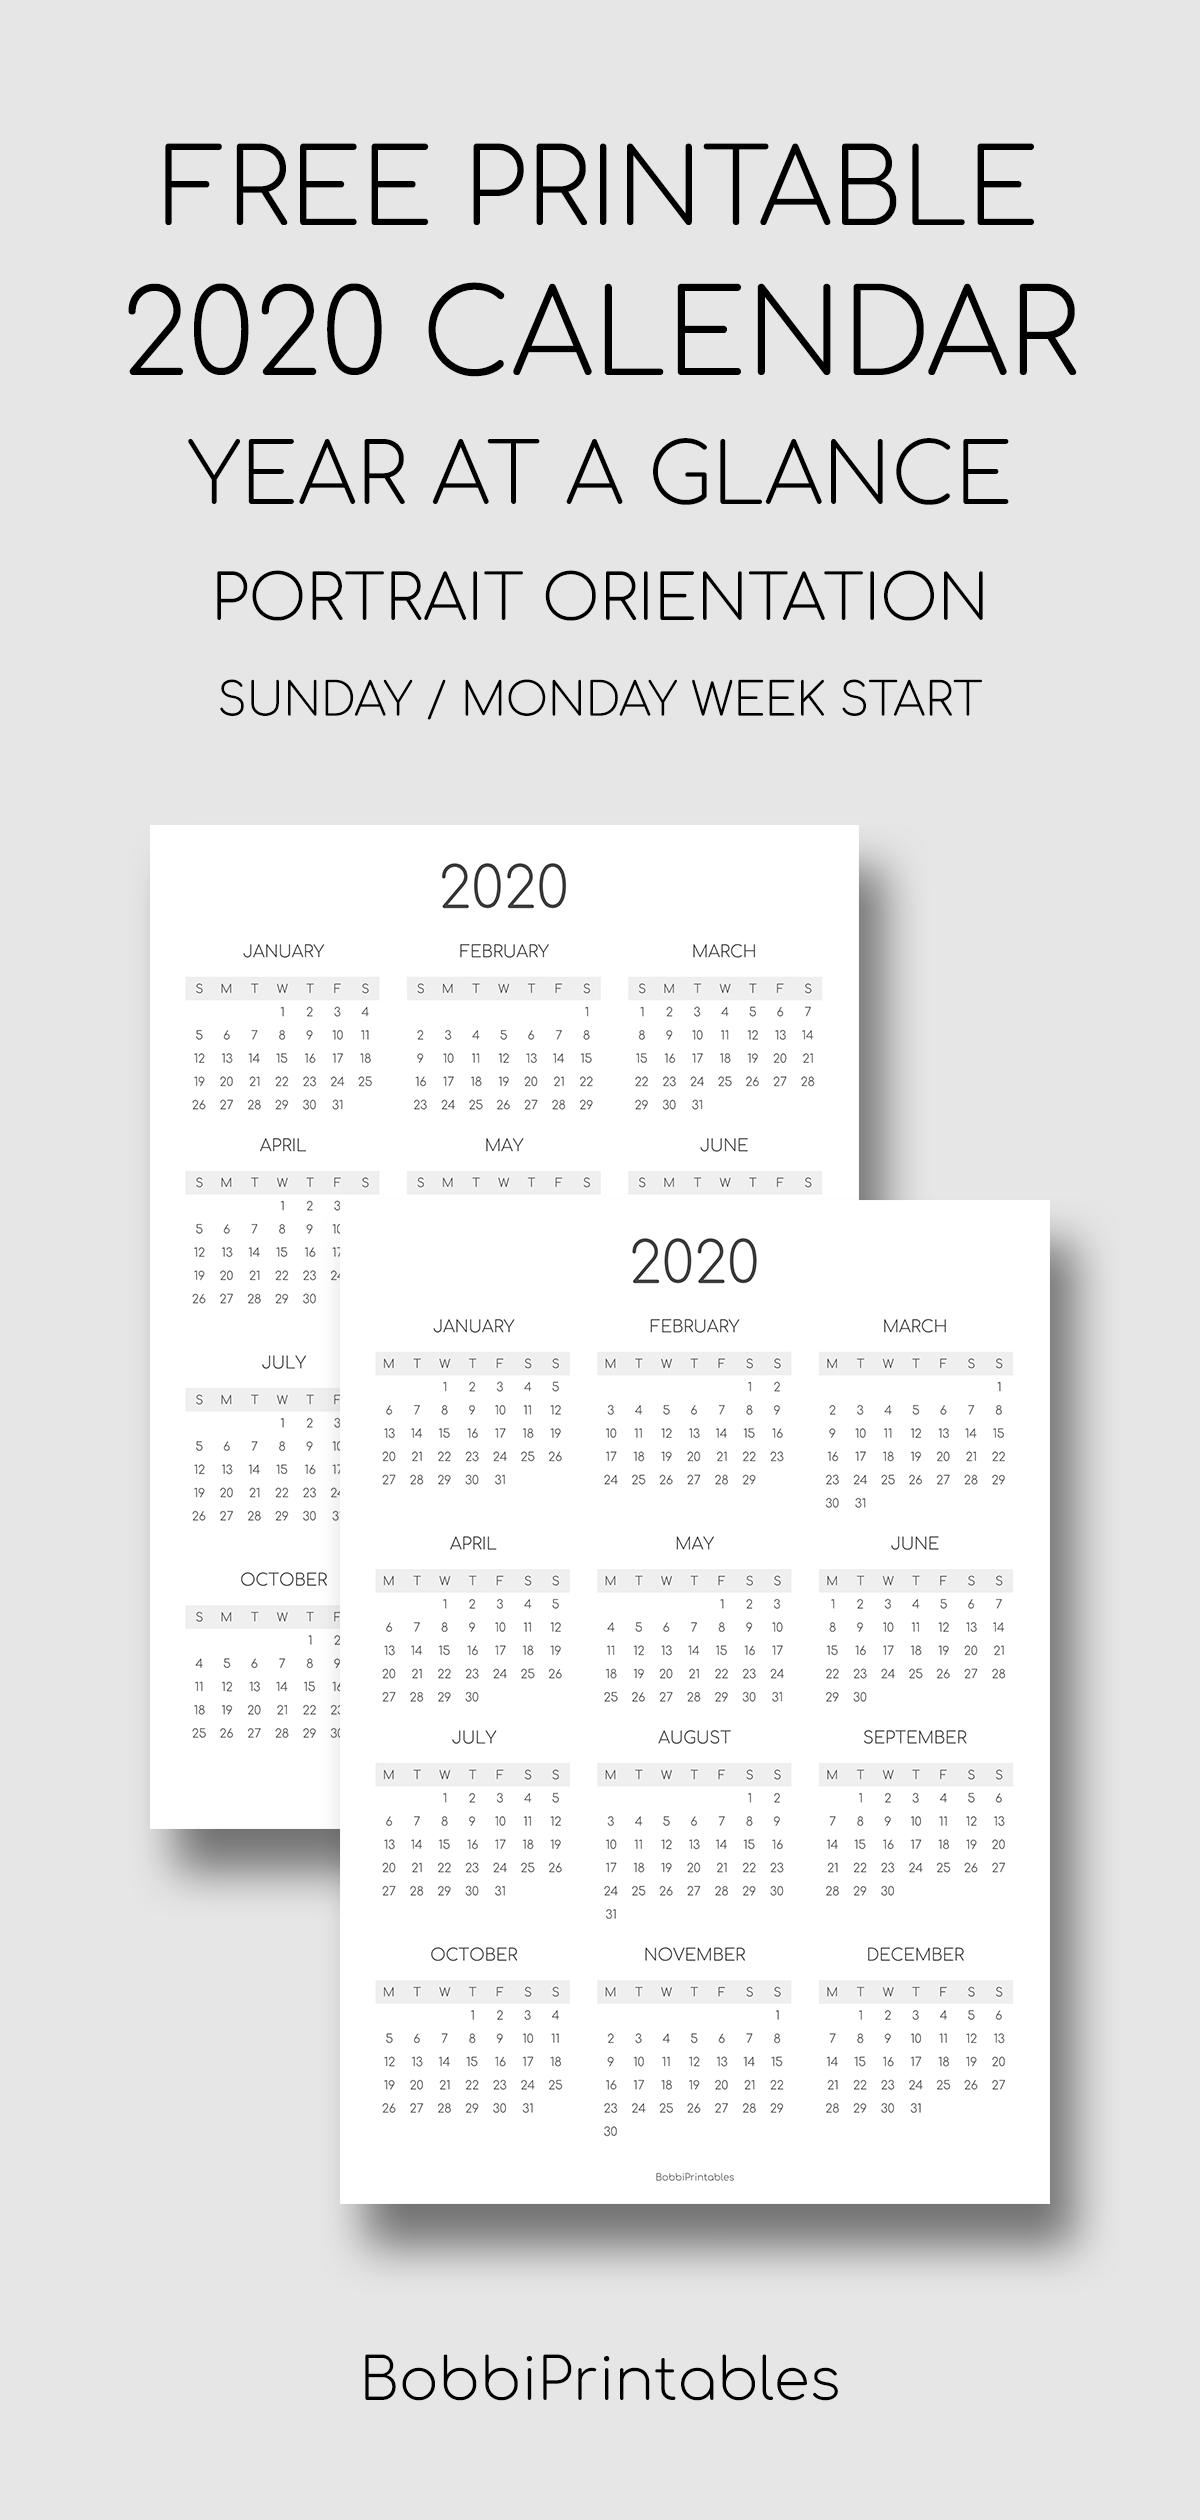 Printable 2020 Calendar - Portrait | At A Glance Calendar within Printable Year At A Glance Calendar